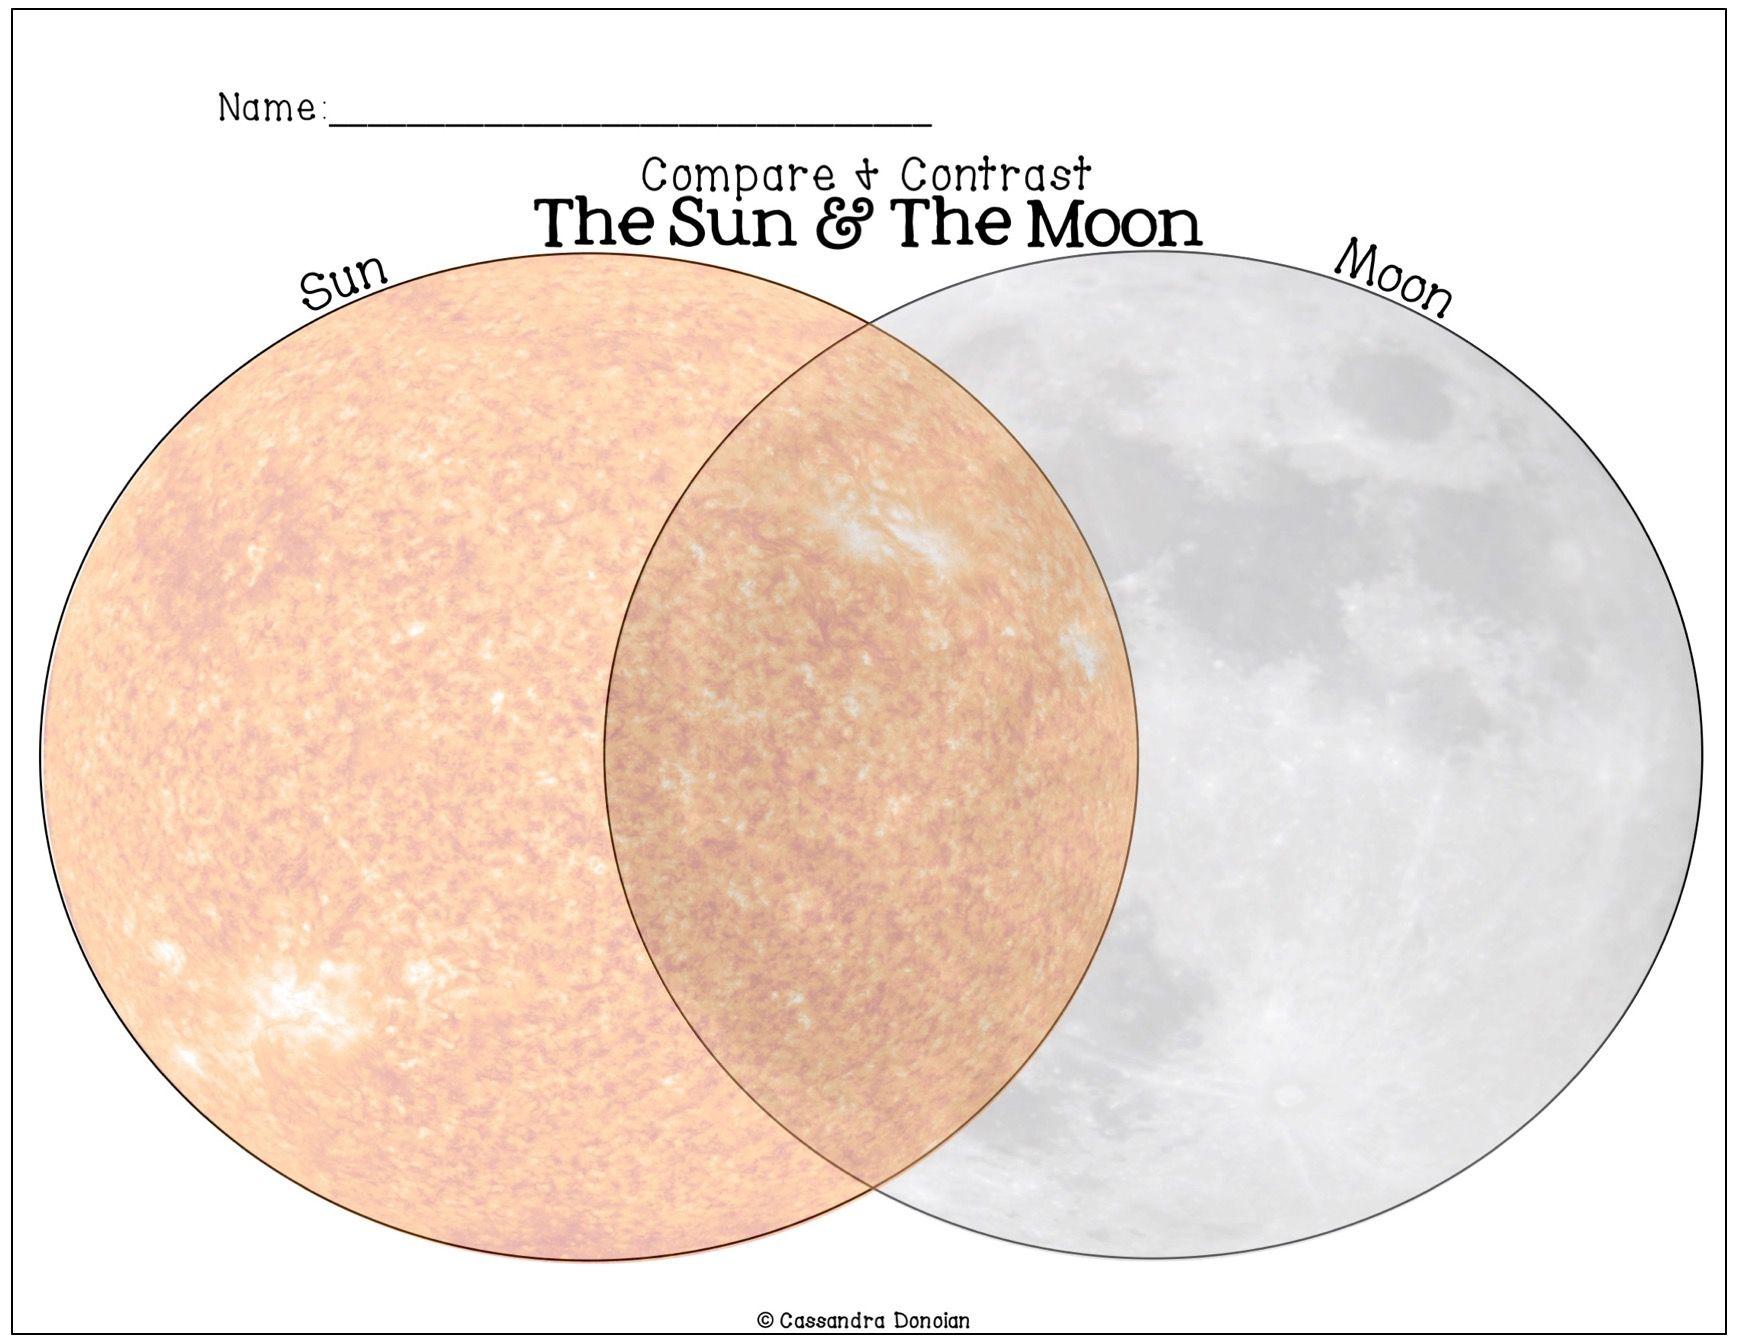 Perfect Graphic Organizer To Compare And Contrast The Sun